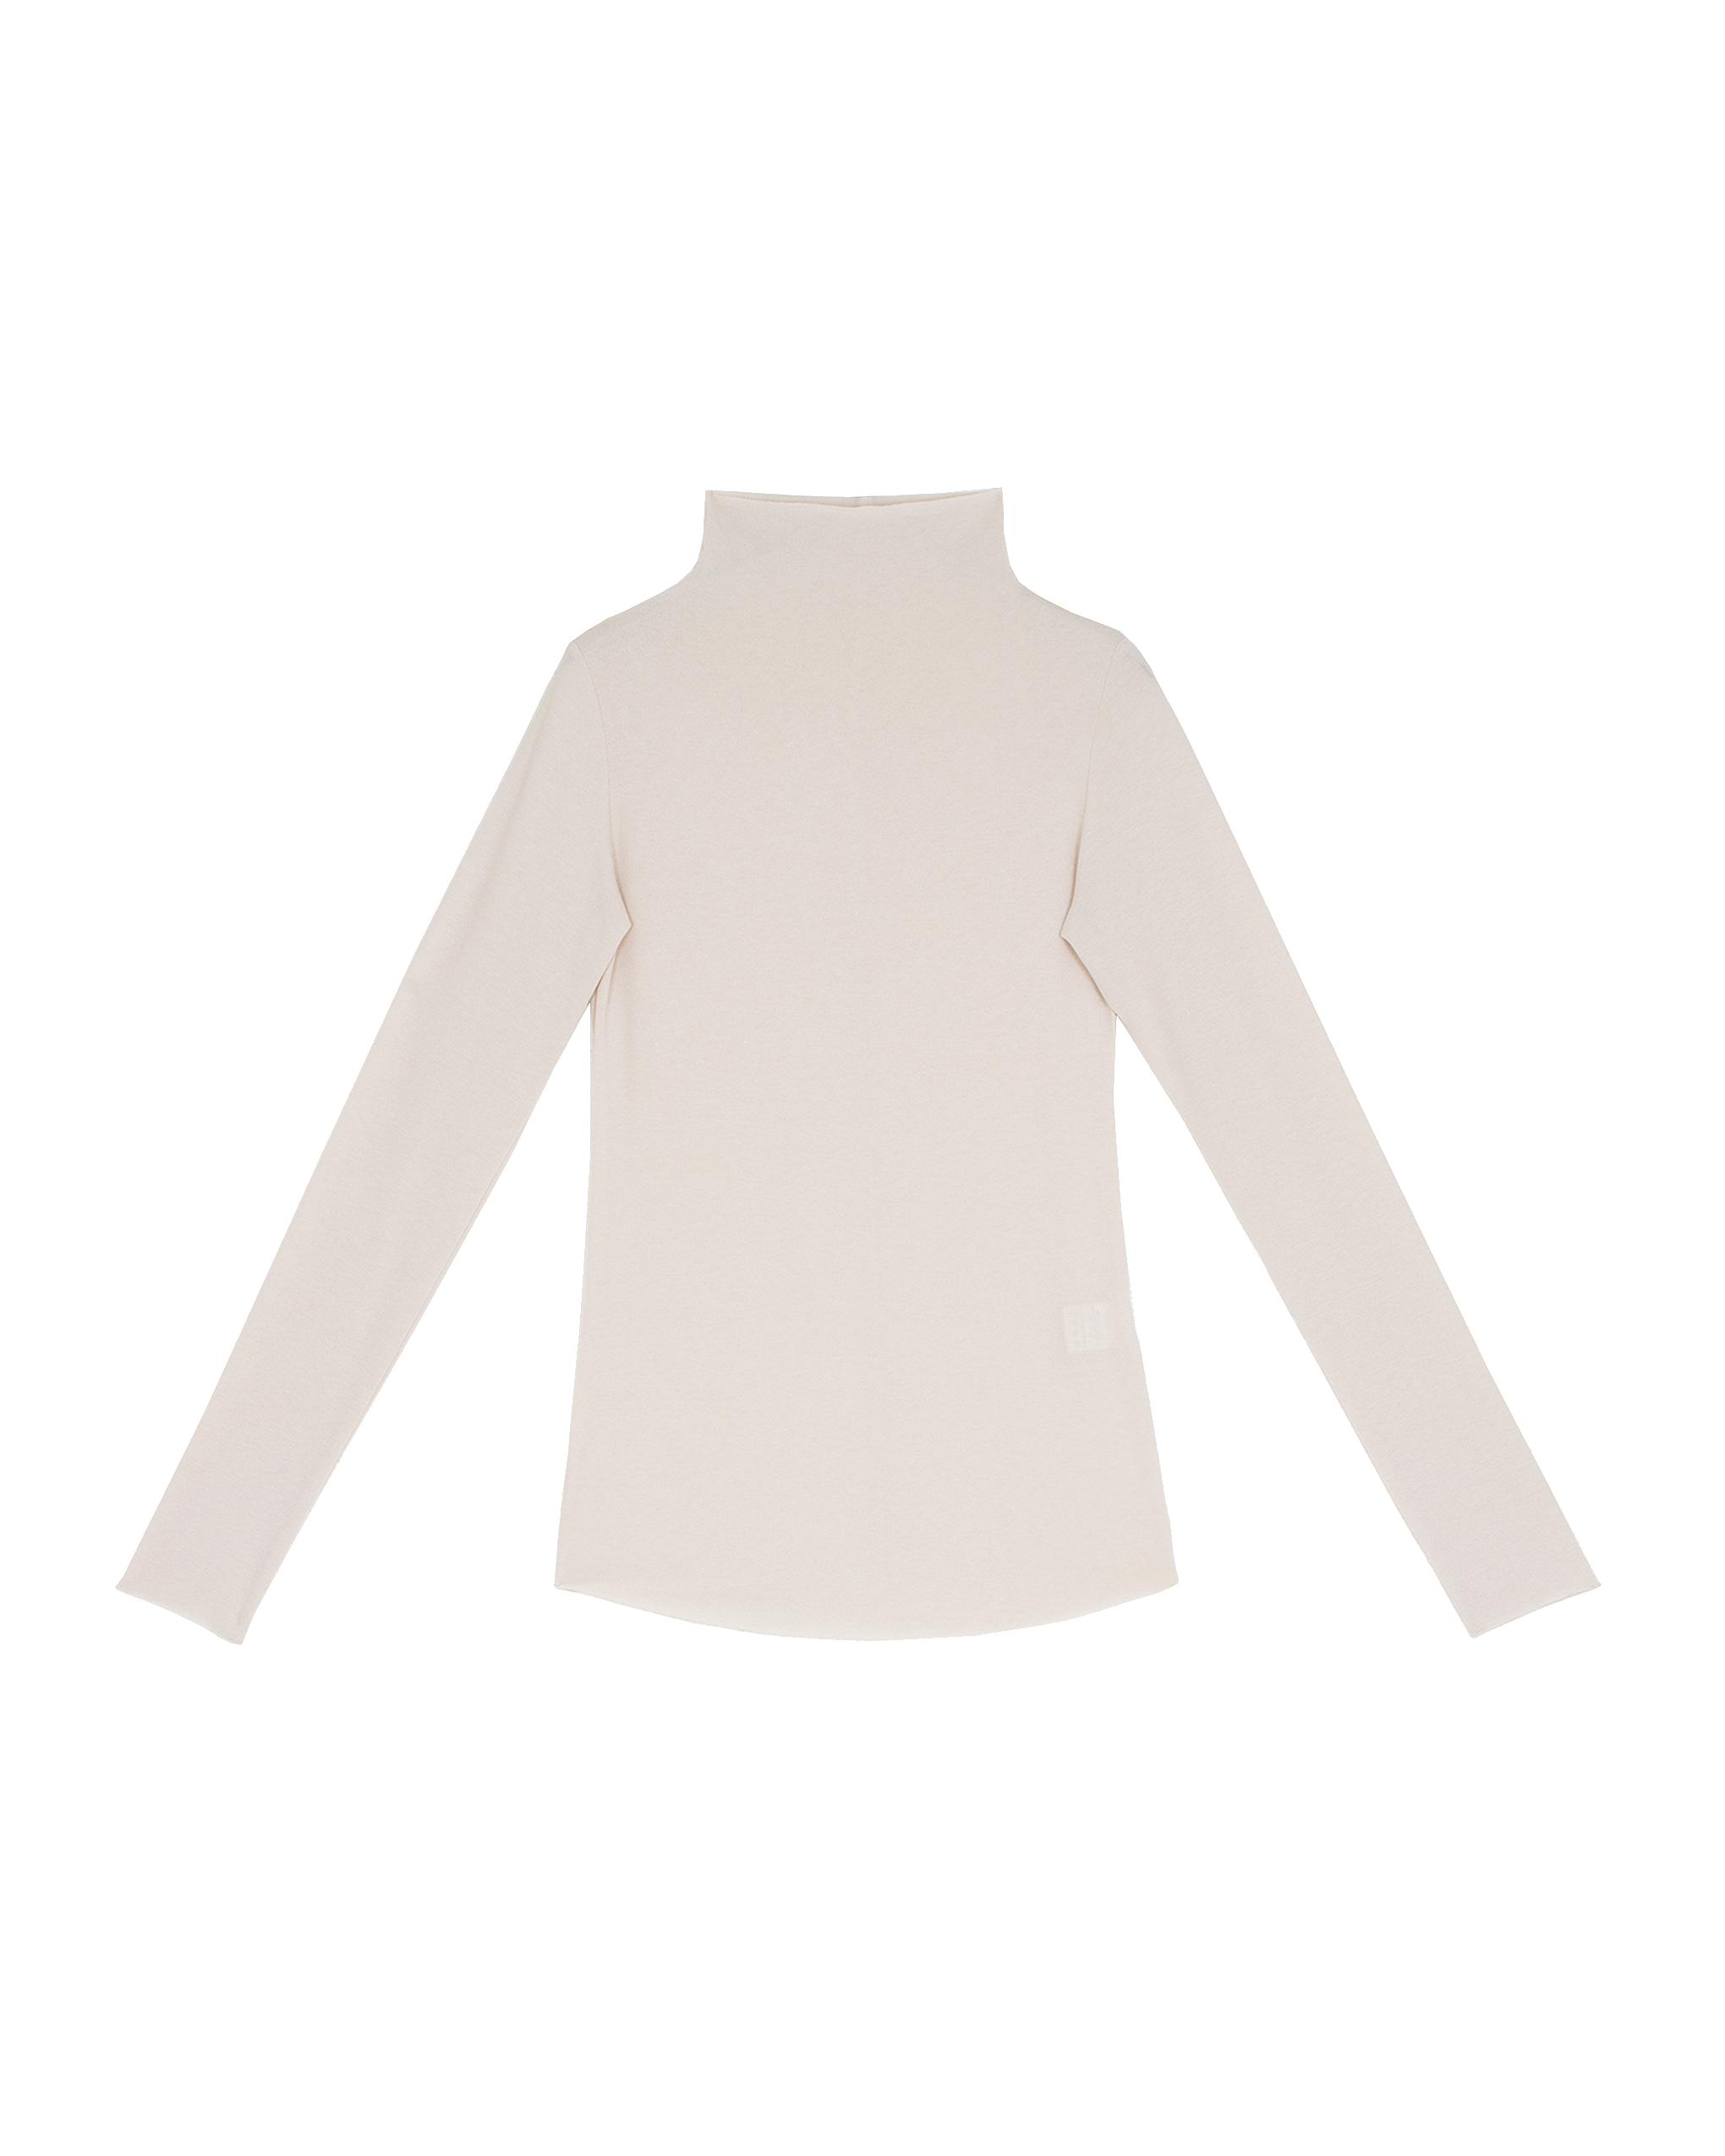 EMIN + PAUL cream second skin jersey blouse.